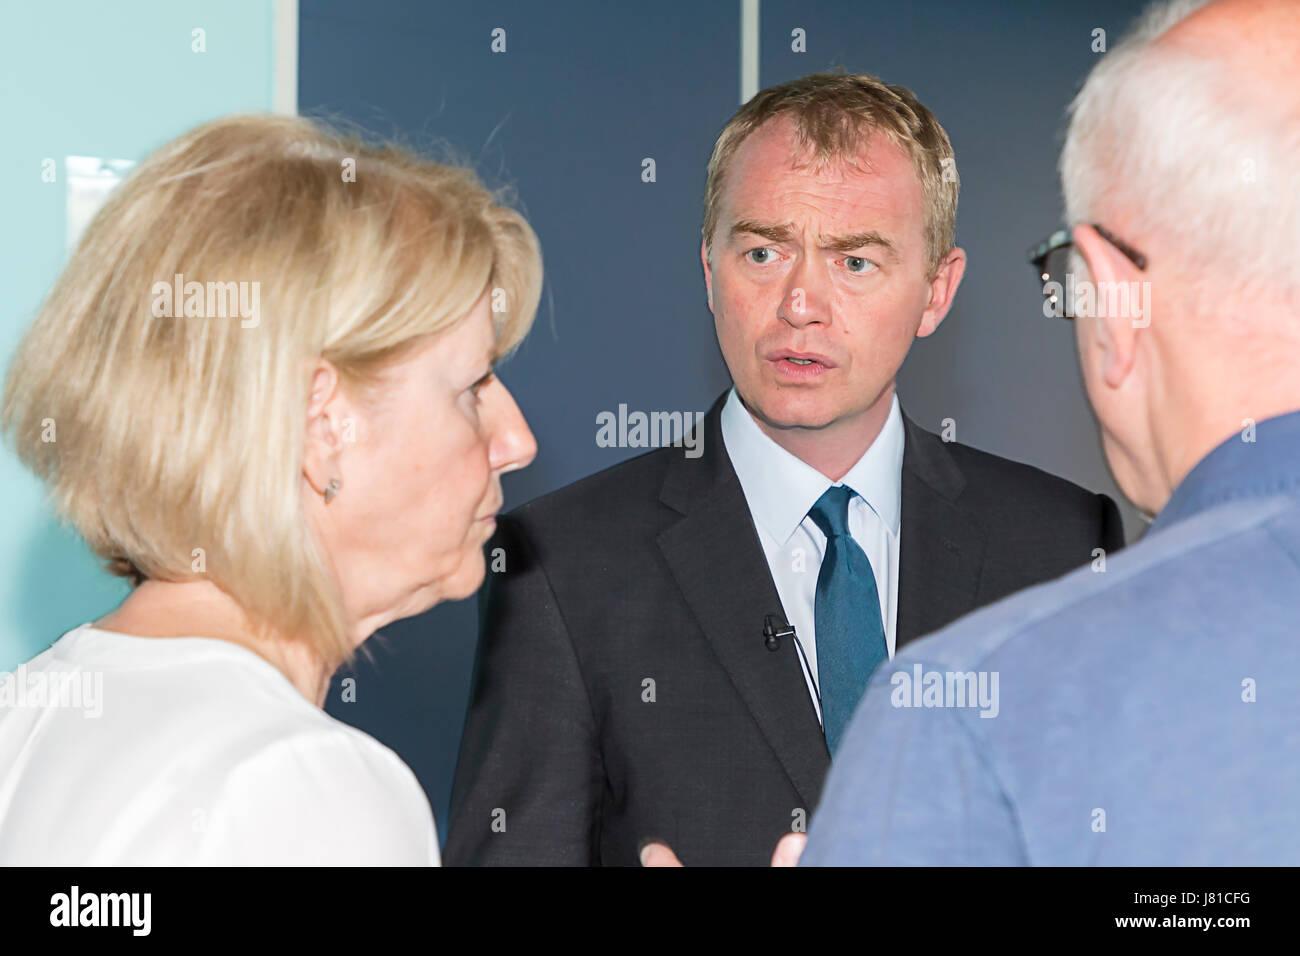 Warrington, UK. 26th May, 2017. Warrington, UK. 26th May, 2017. Leaader of the Liberal Democrats, Tim Farron, talks - Stock Image